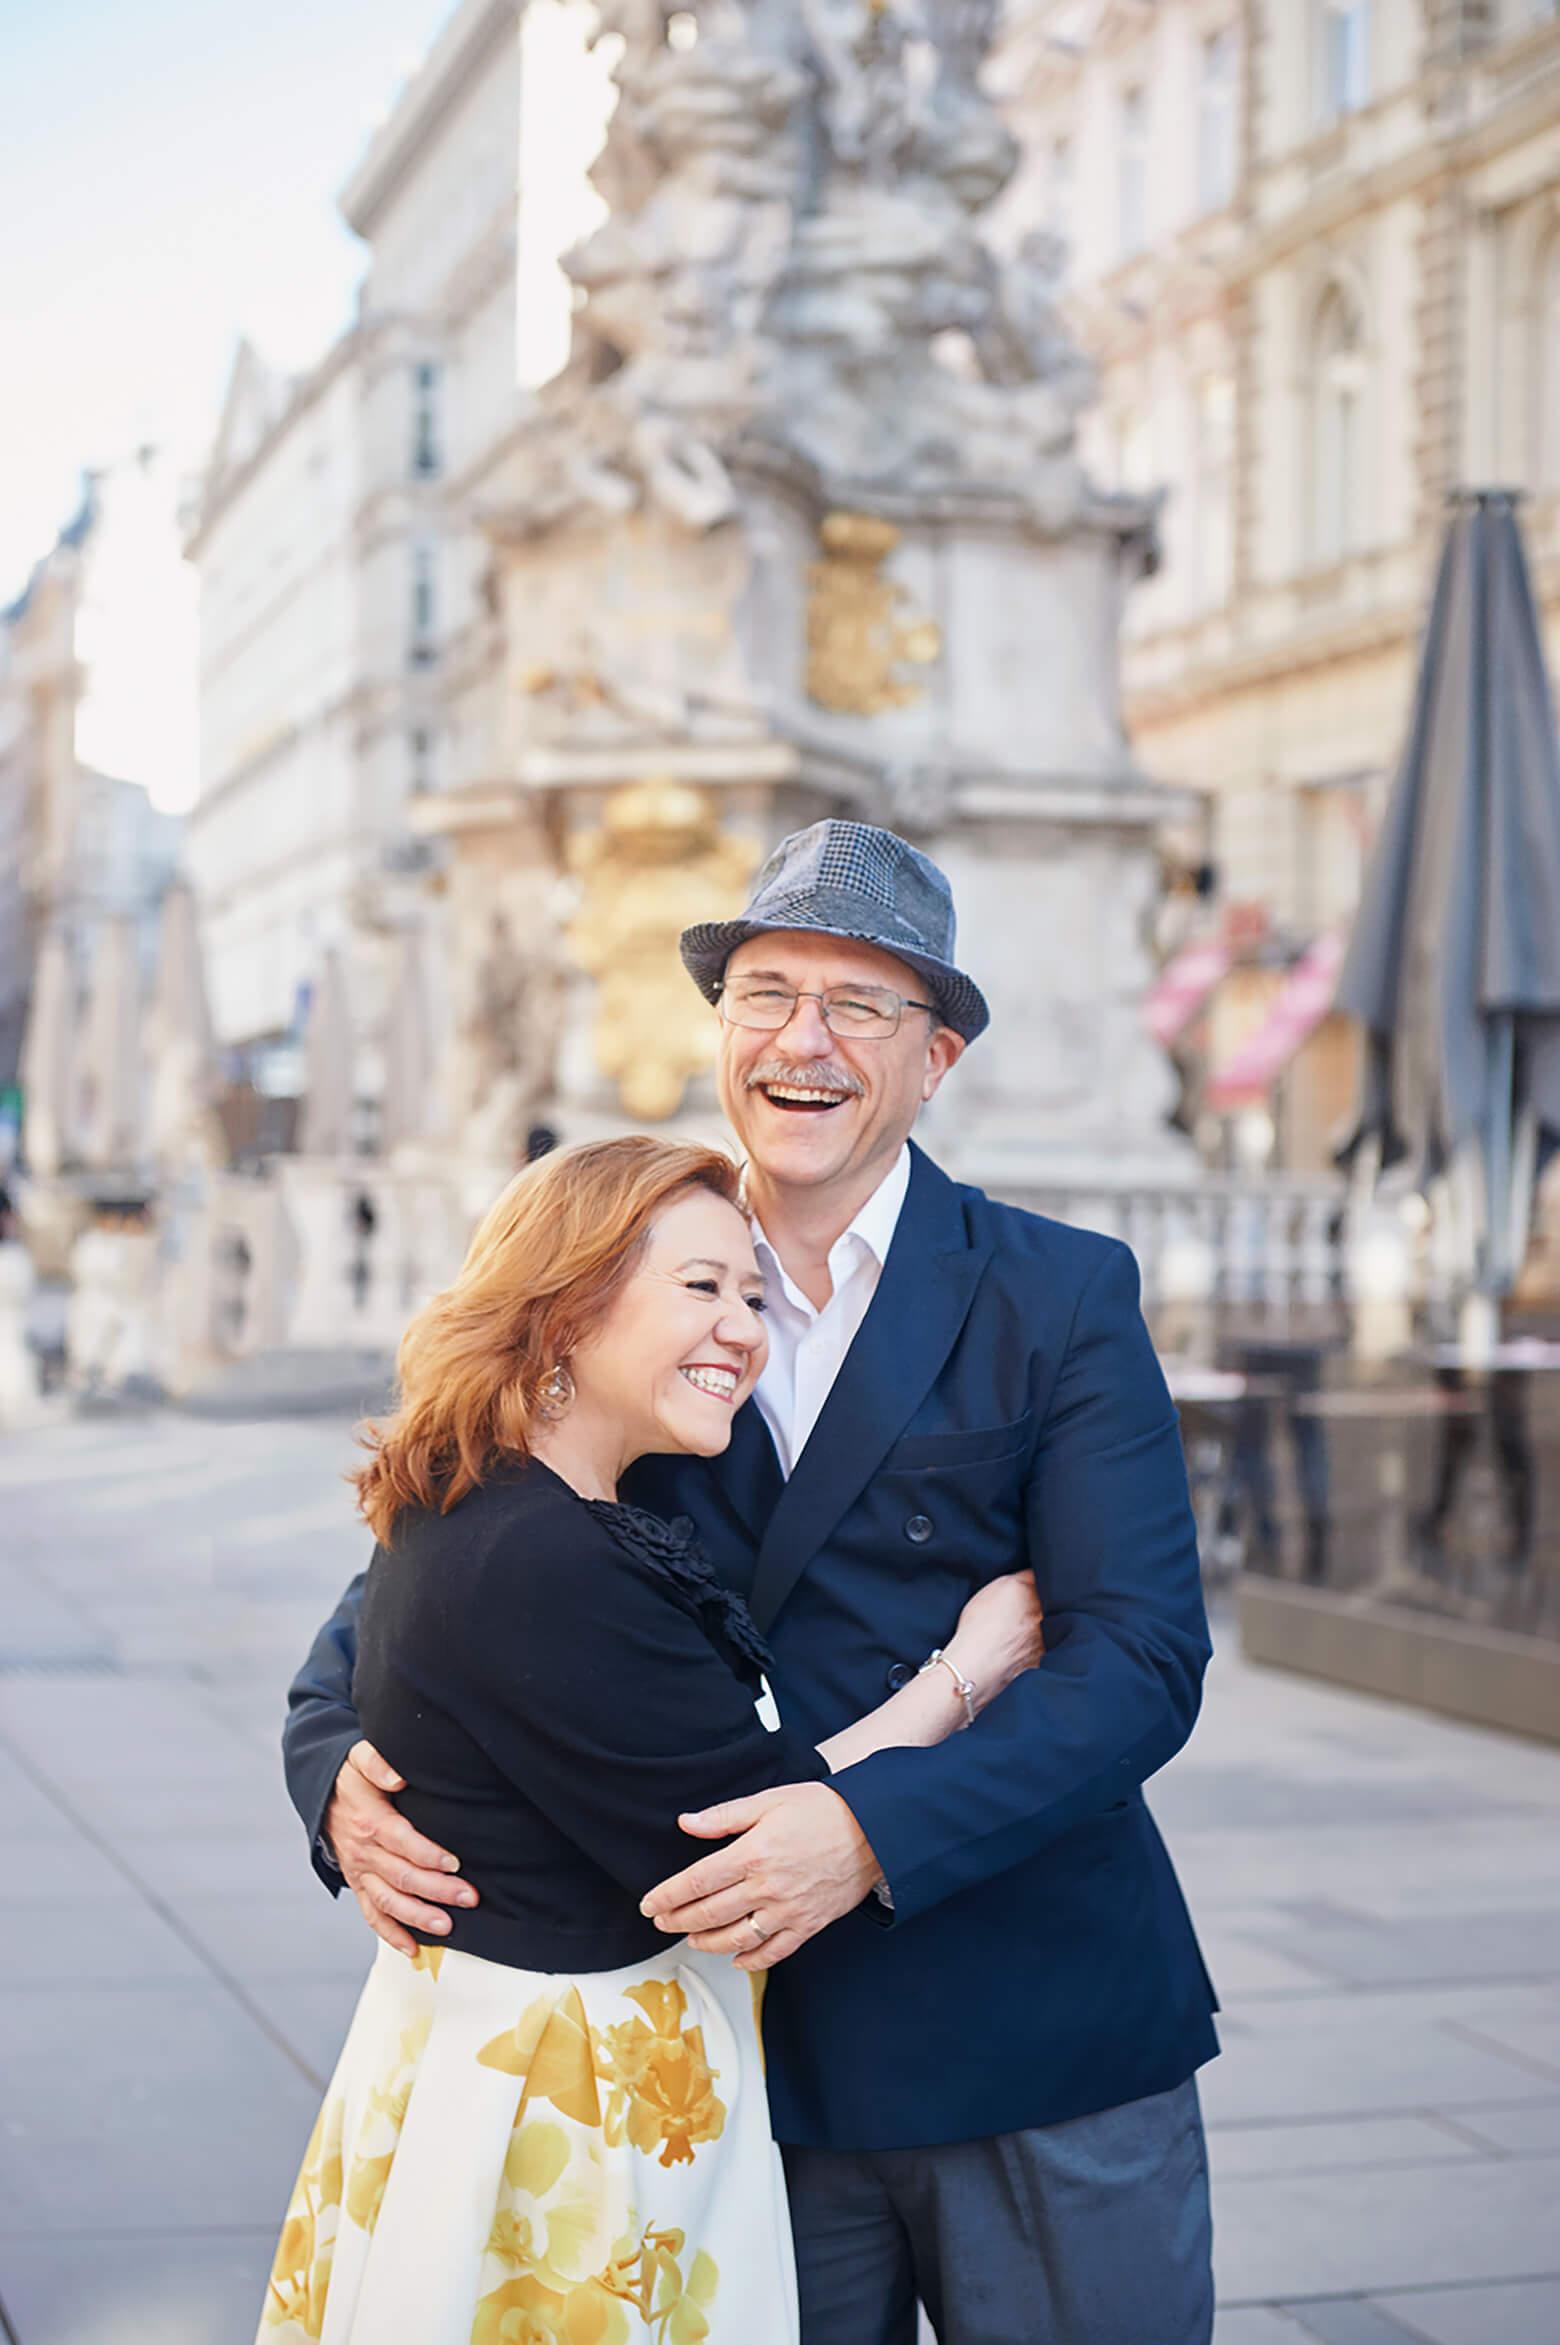 lovebirds, couple, 50+, elopement, photoshoot, vienna, wien, fotografie, ursula schmitz, liebe, paar shoot, love, verliebt, verlobt, verheiratet, anniversary